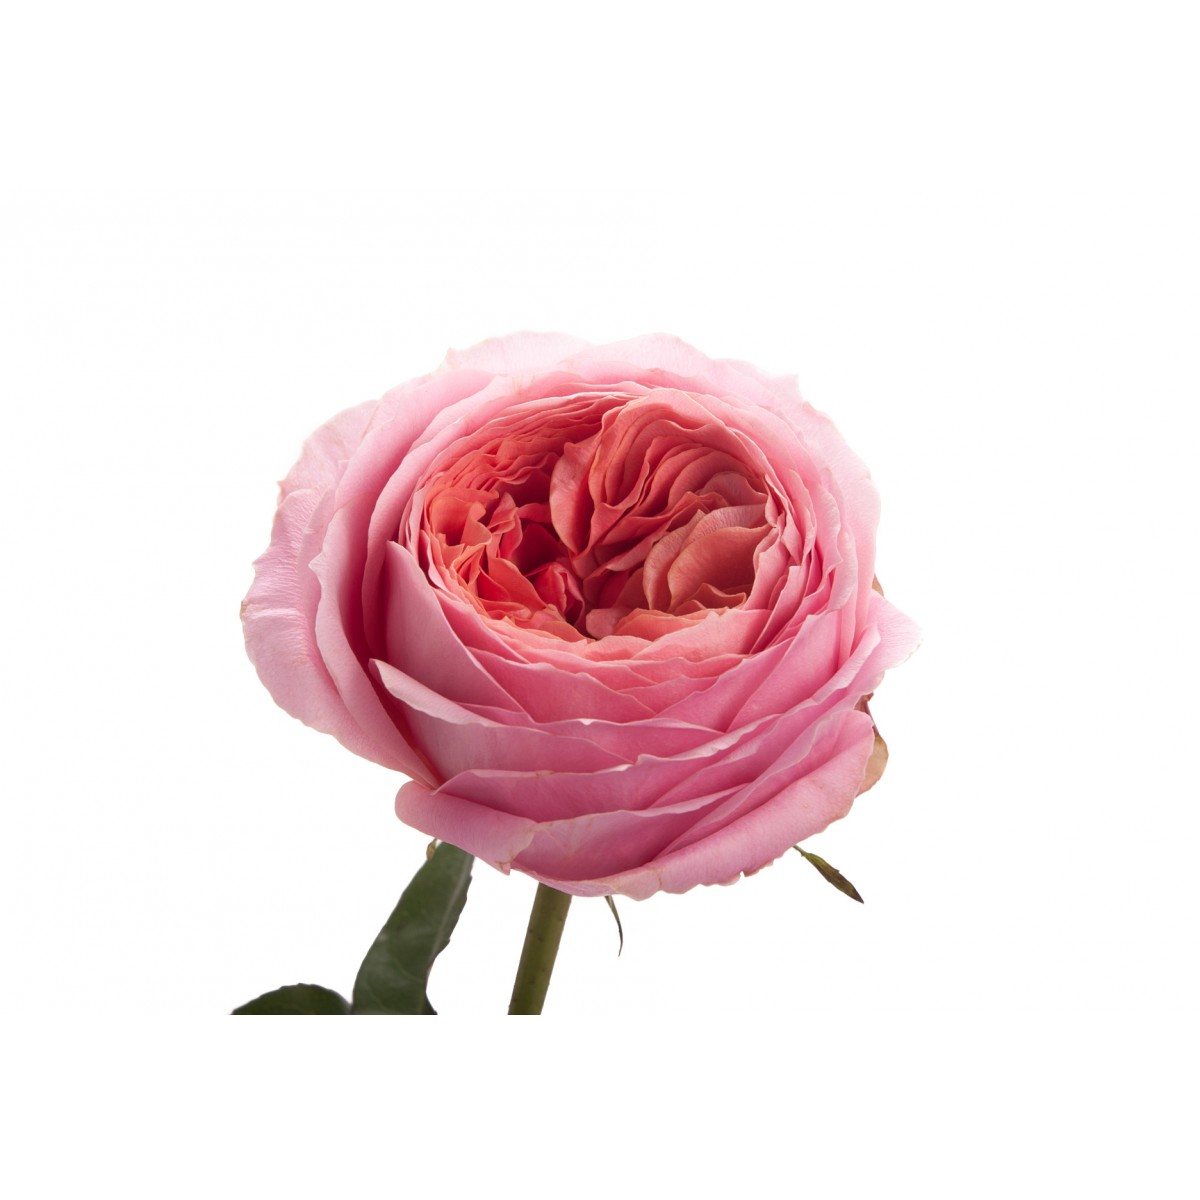 Rosa Garden Romantic Antique (Роза Гарден Романтик Антикви) В50